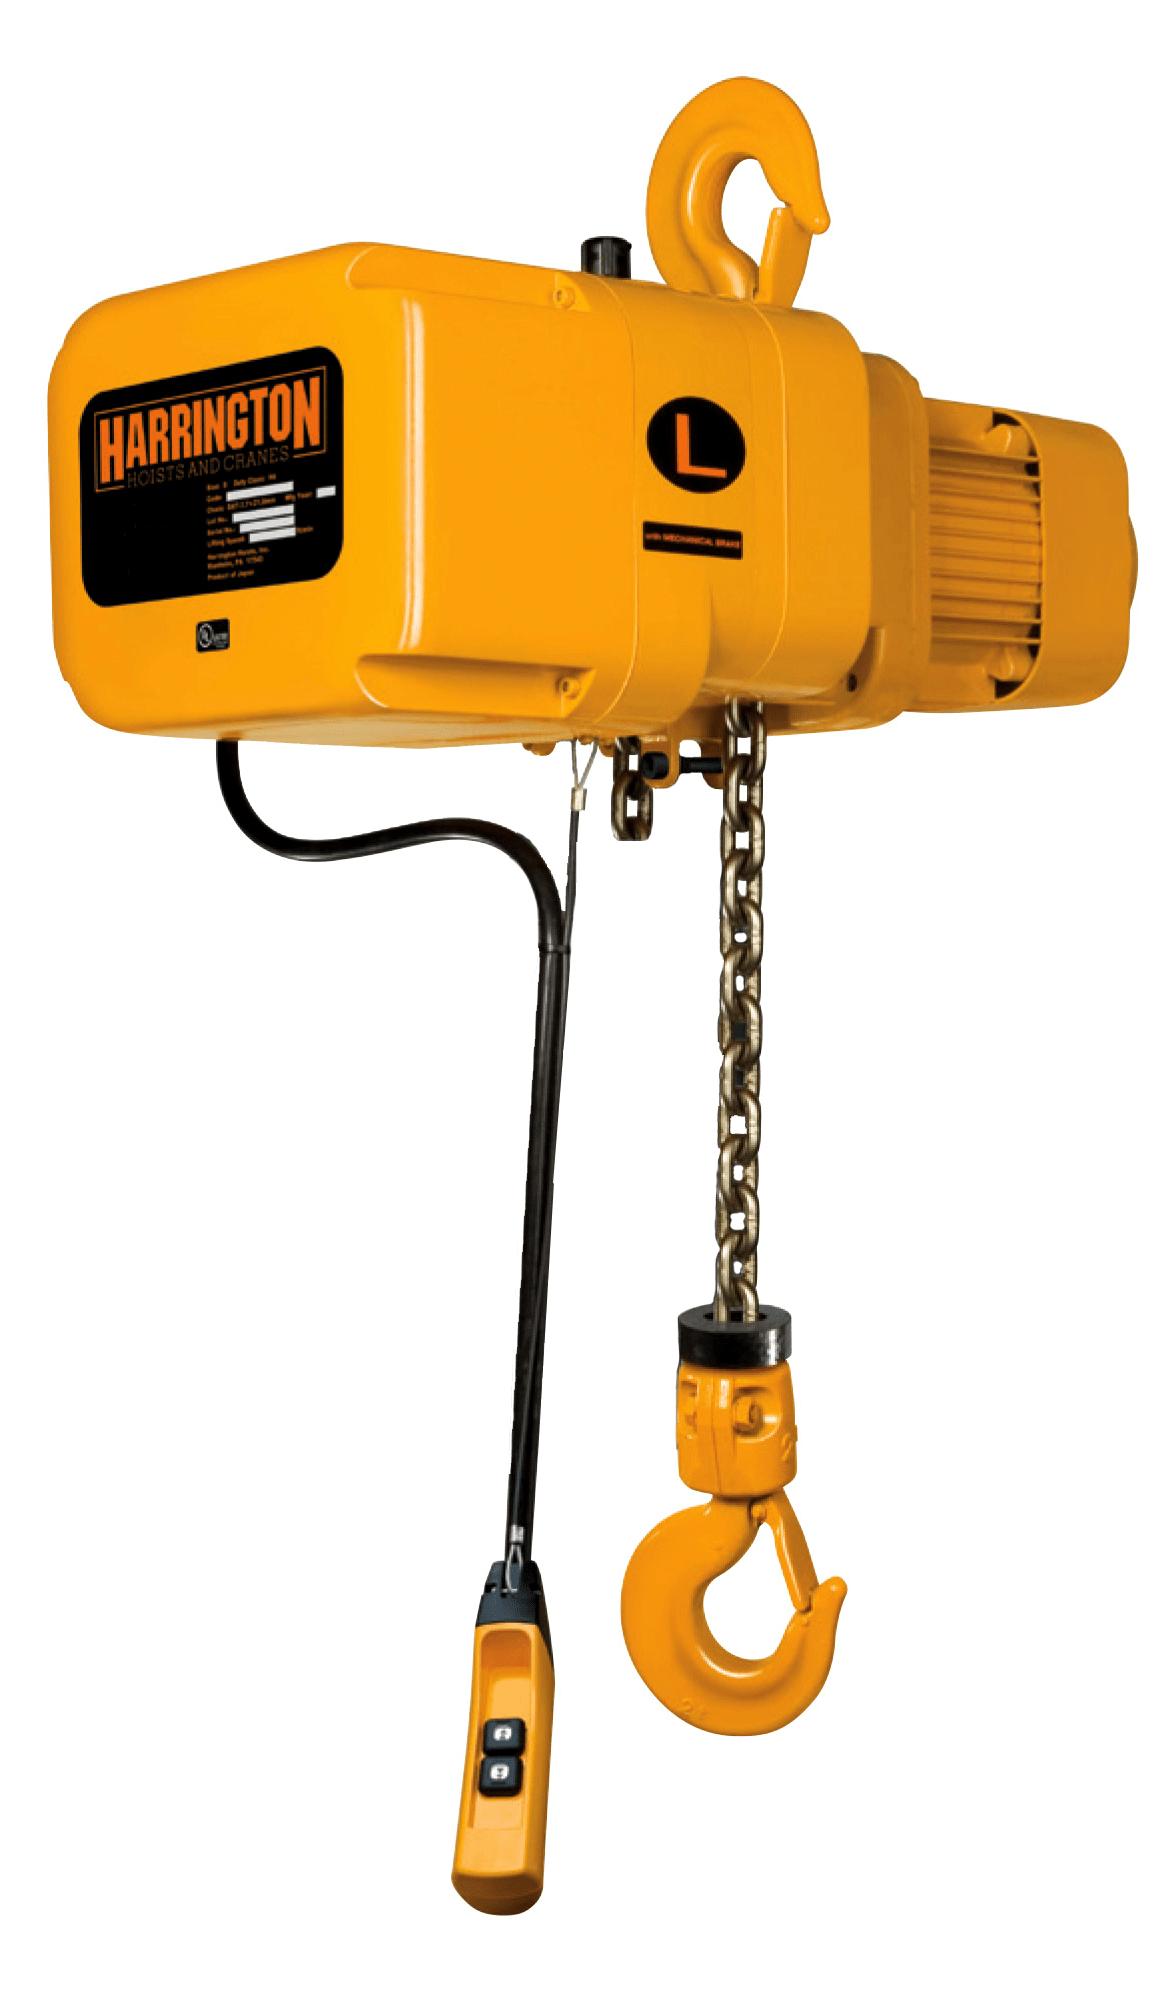 hight resolution of harrington ner electric chain hoist